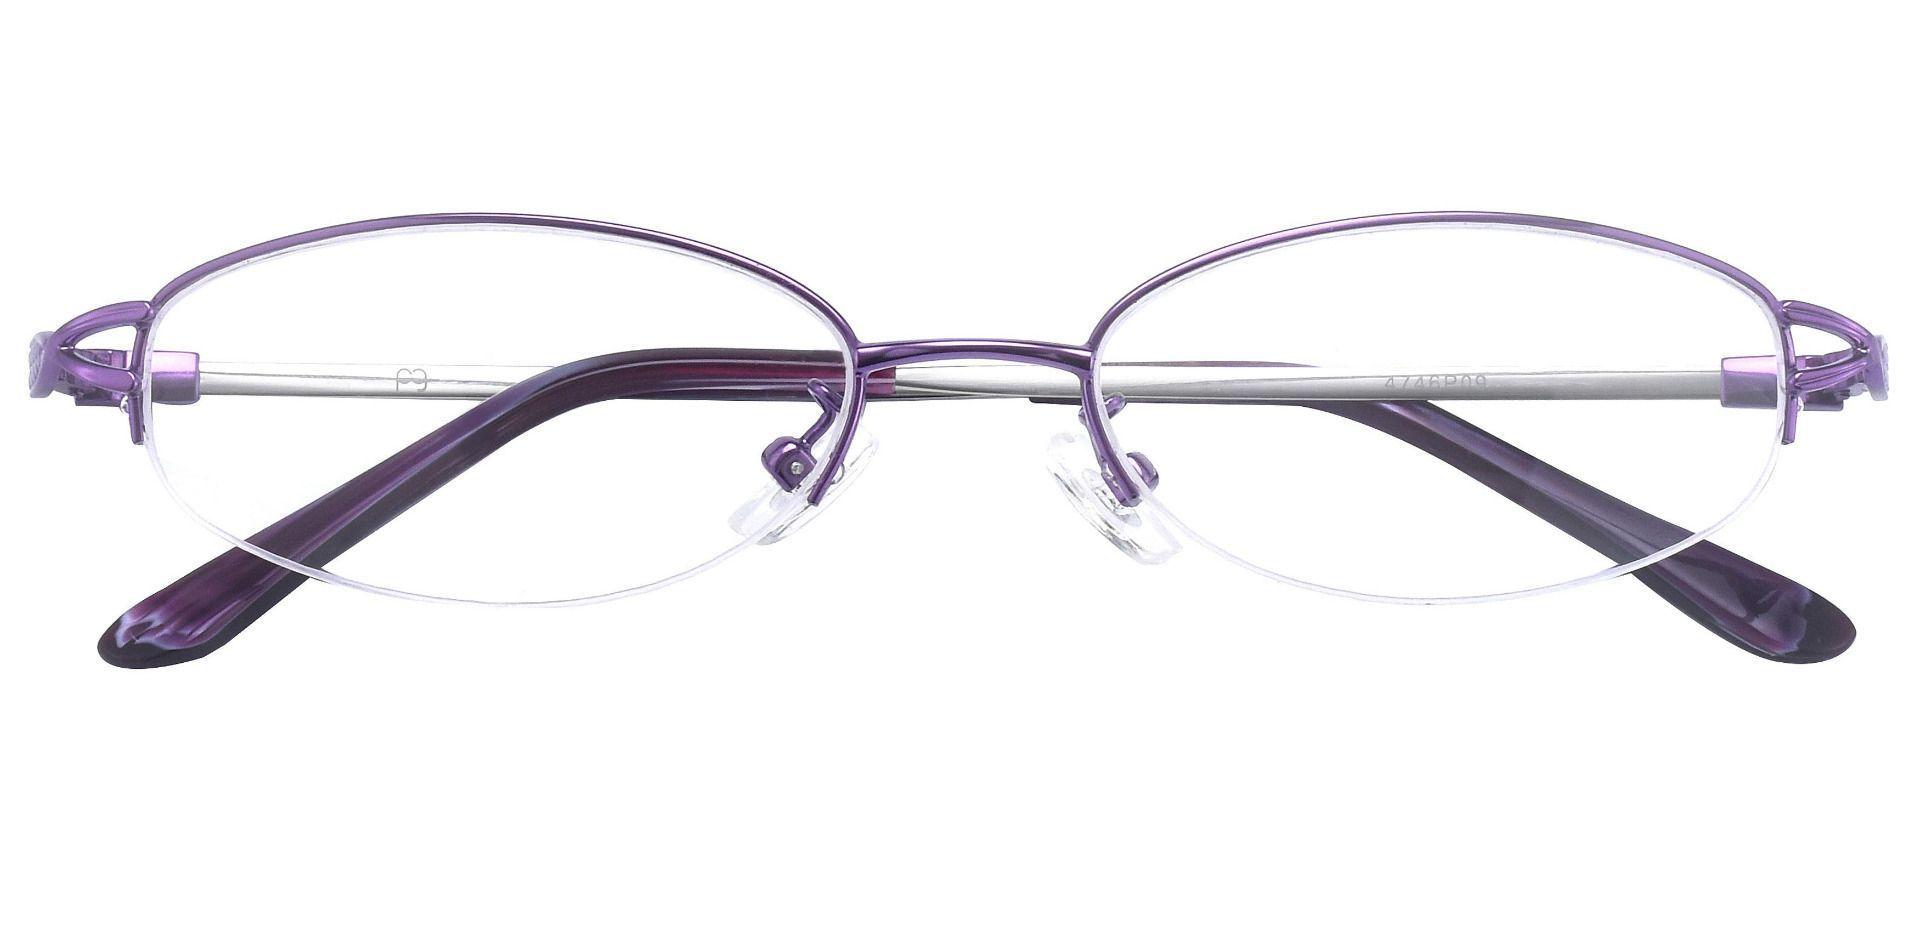 Pacific Oval Single Vision Glasses - Purple